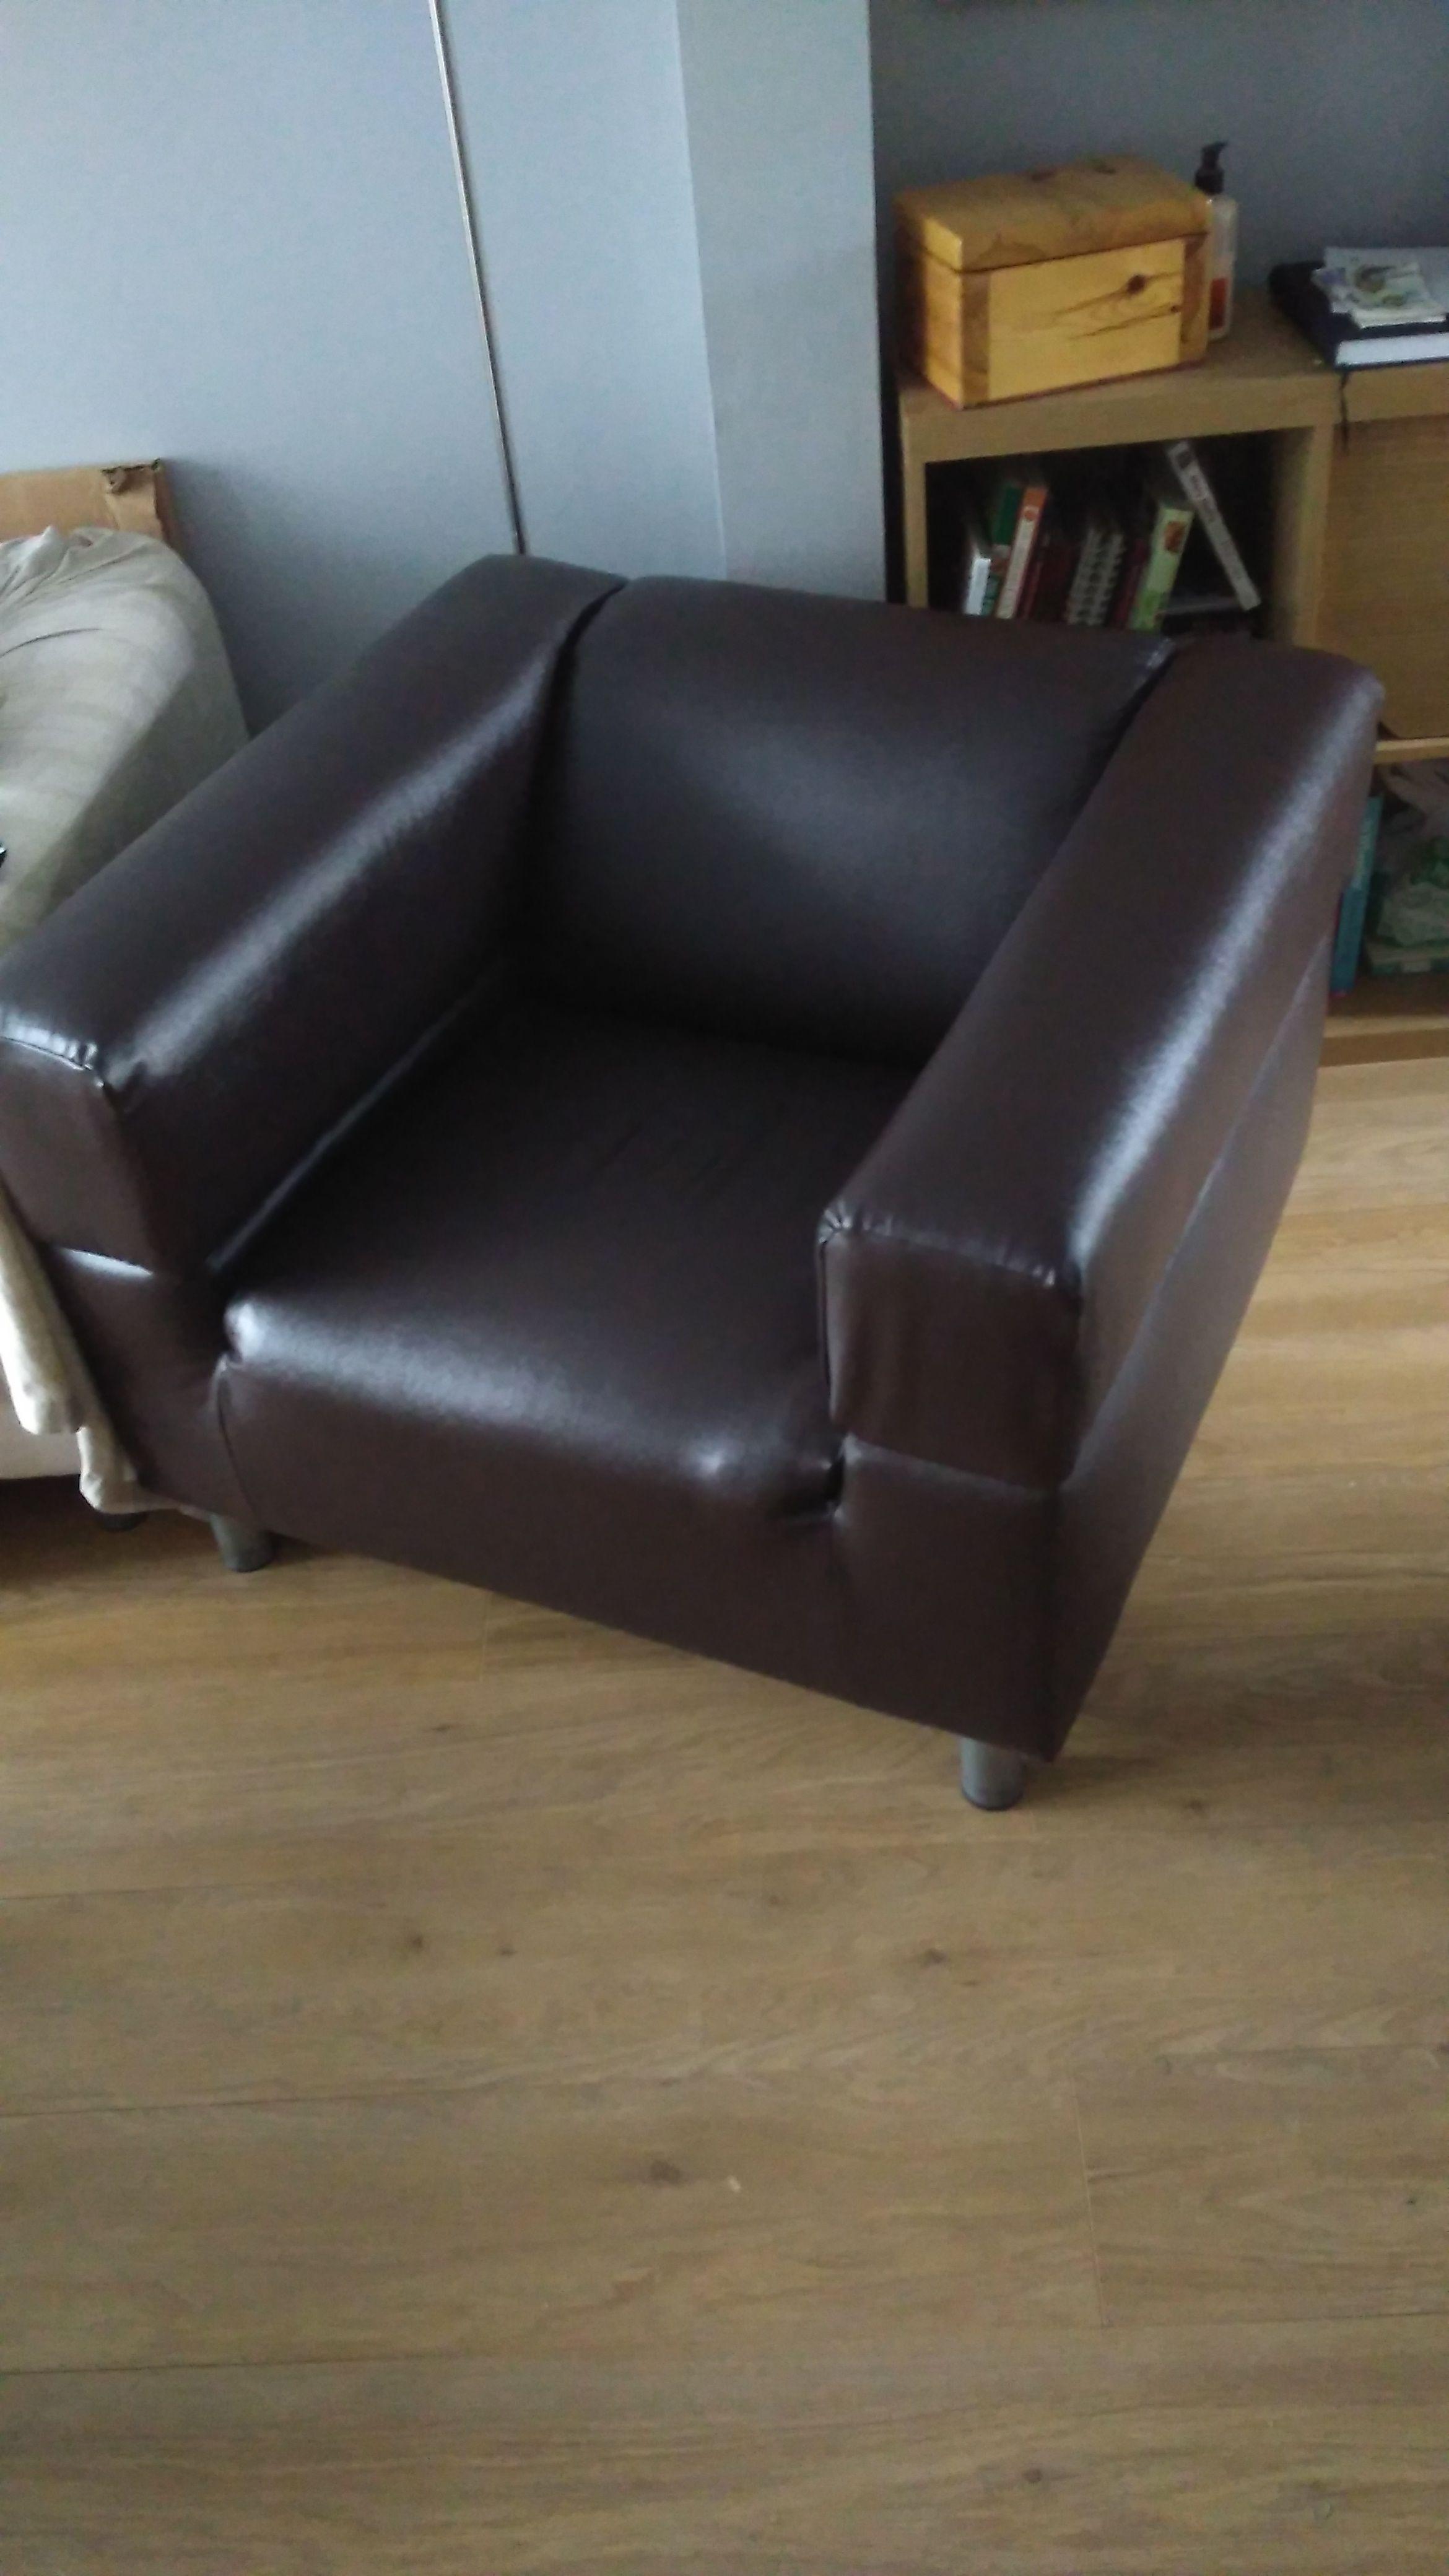 Ikea Klippan 2 Seater Sofa Hack made into an Armchair